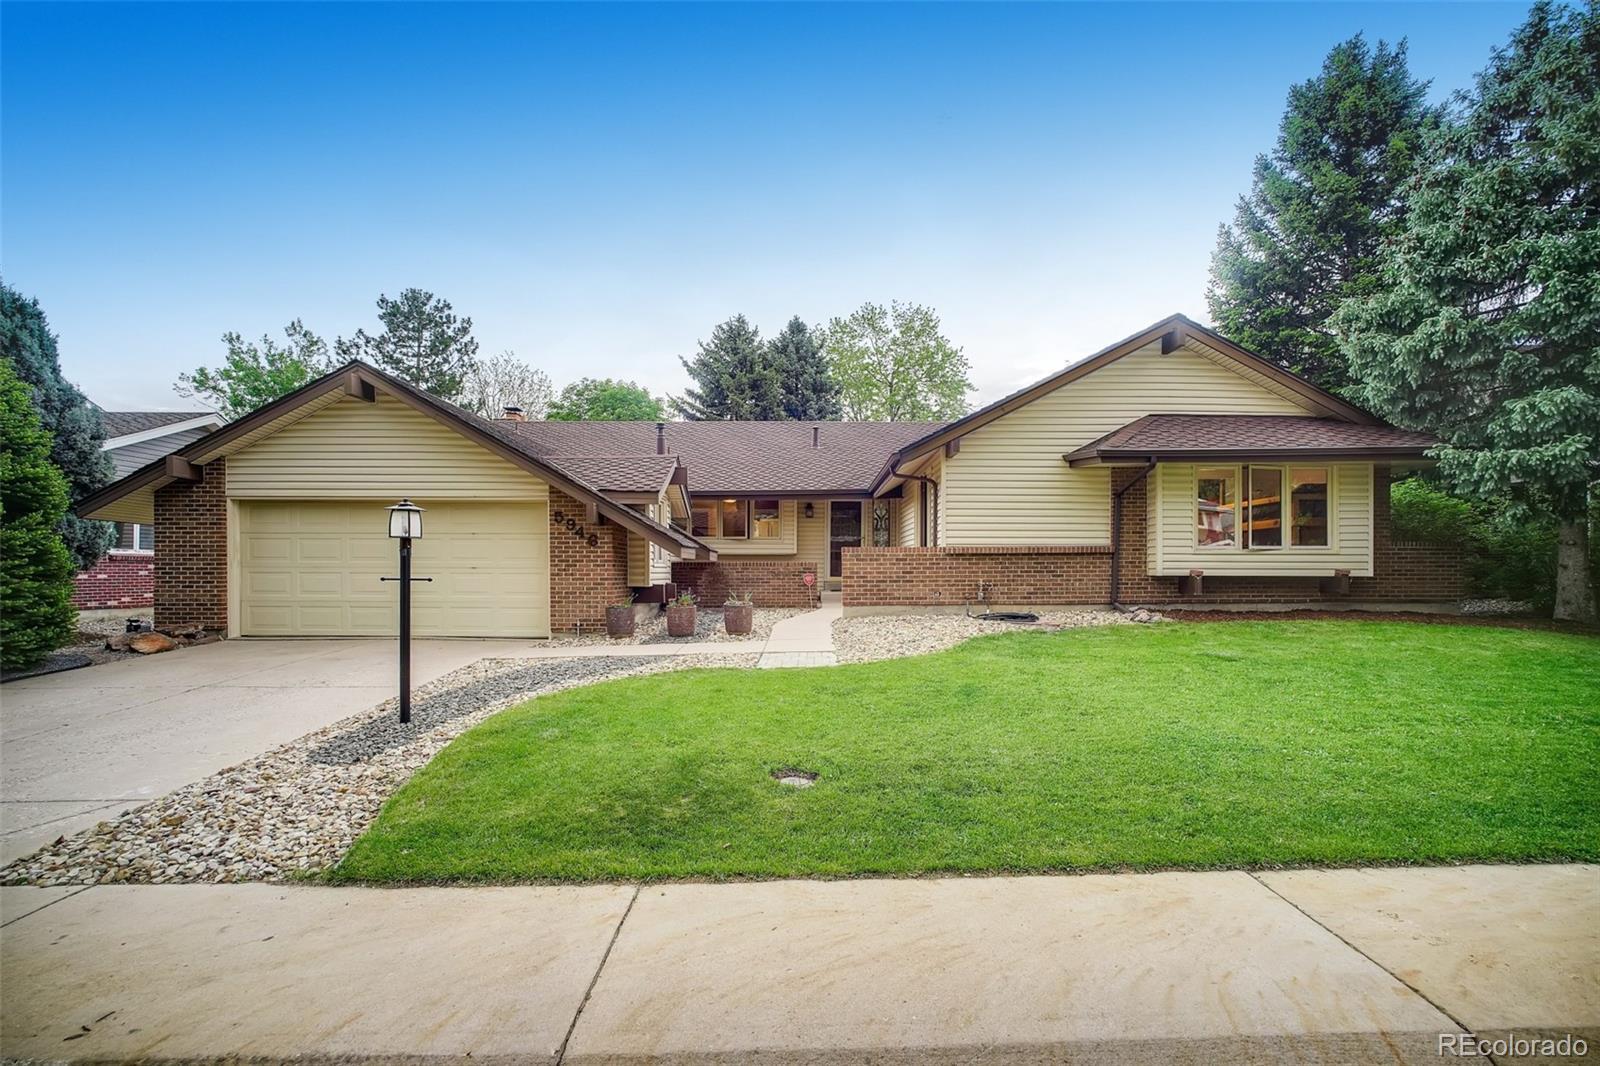 5946 S Fairfax Court, Centennial, CO 80121 - Centennial, CO real estate listing